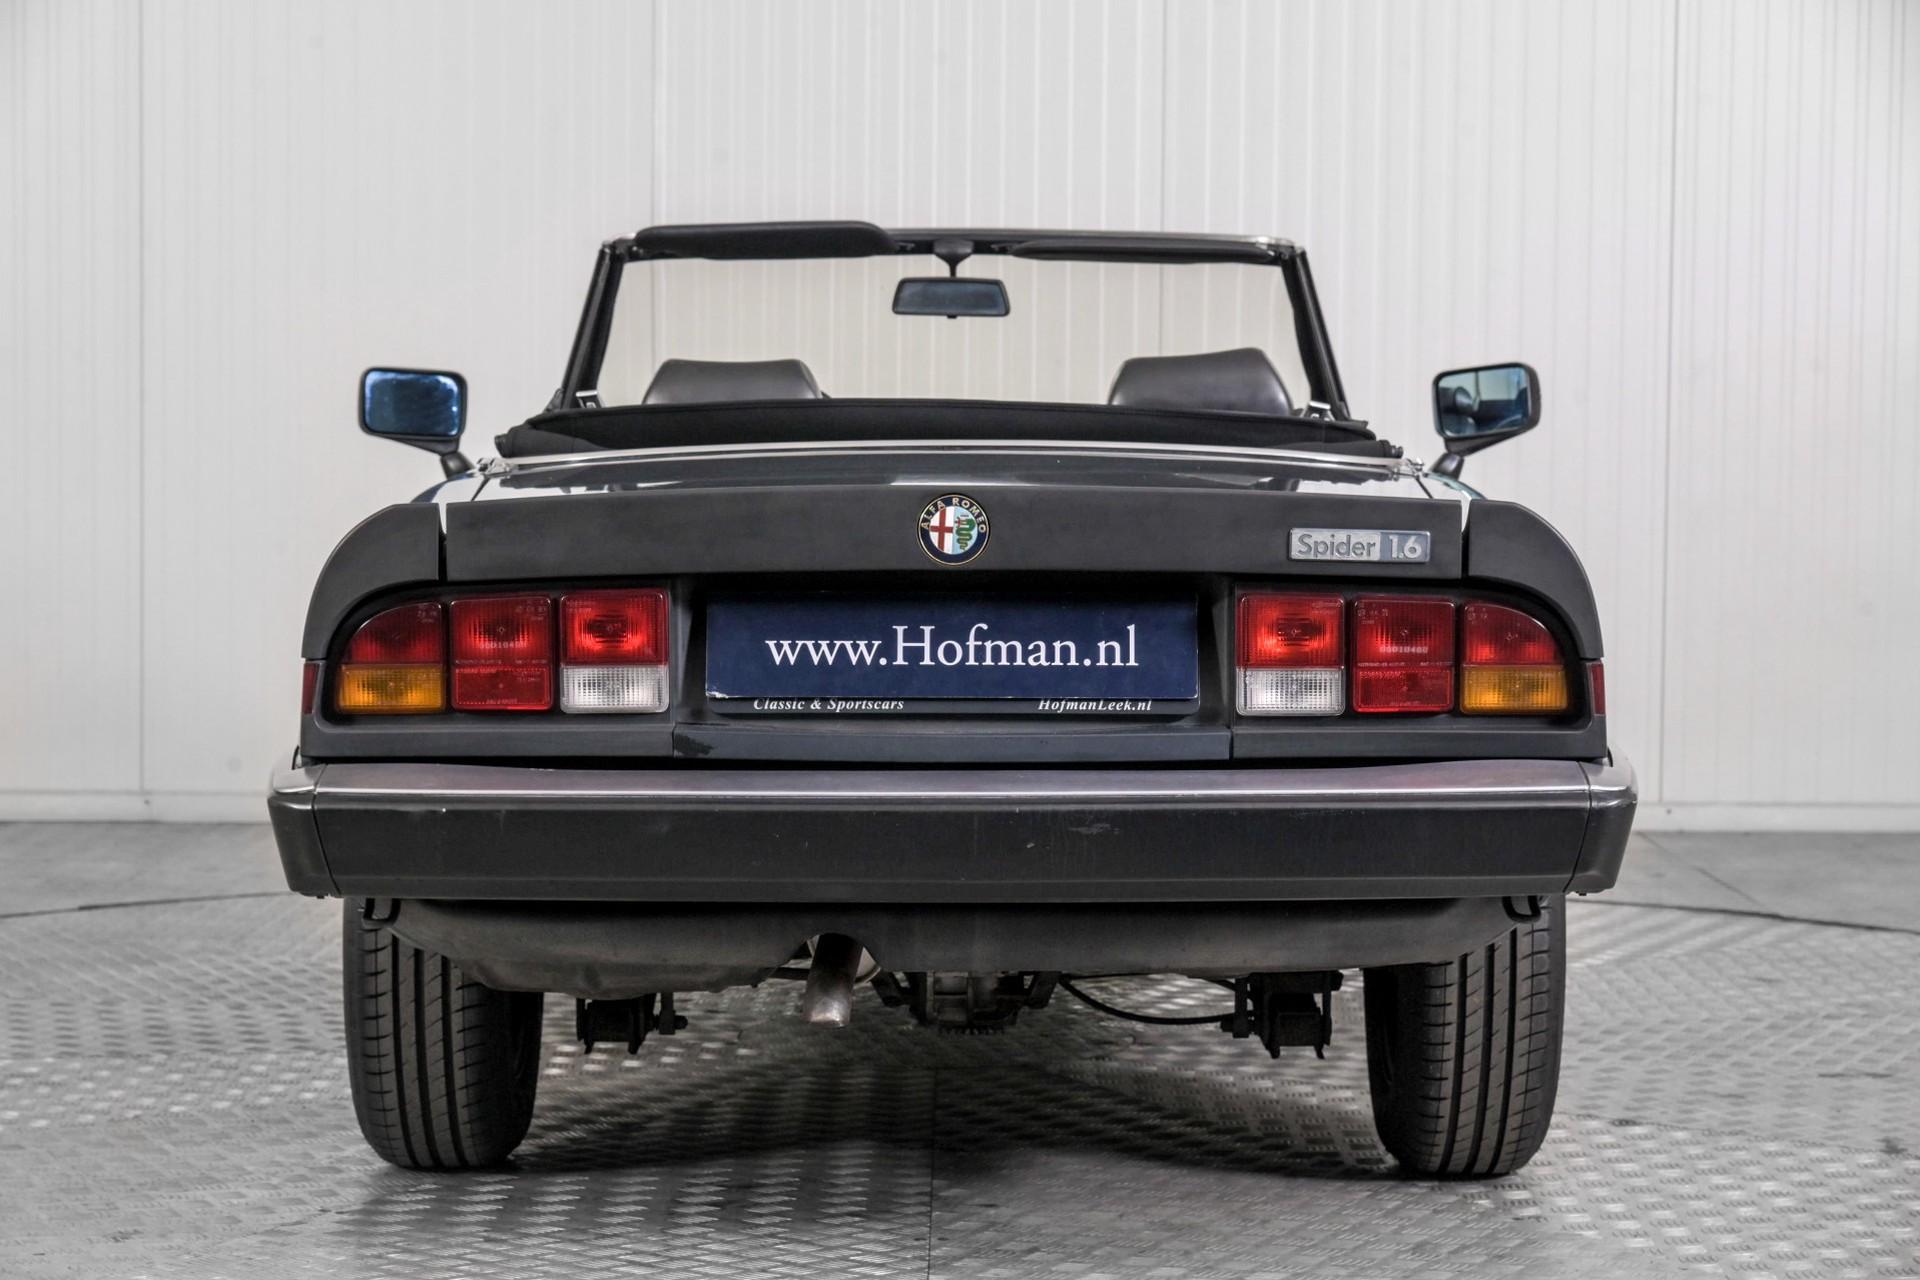 Alfa Romeo Spider 1.6 Foto 12